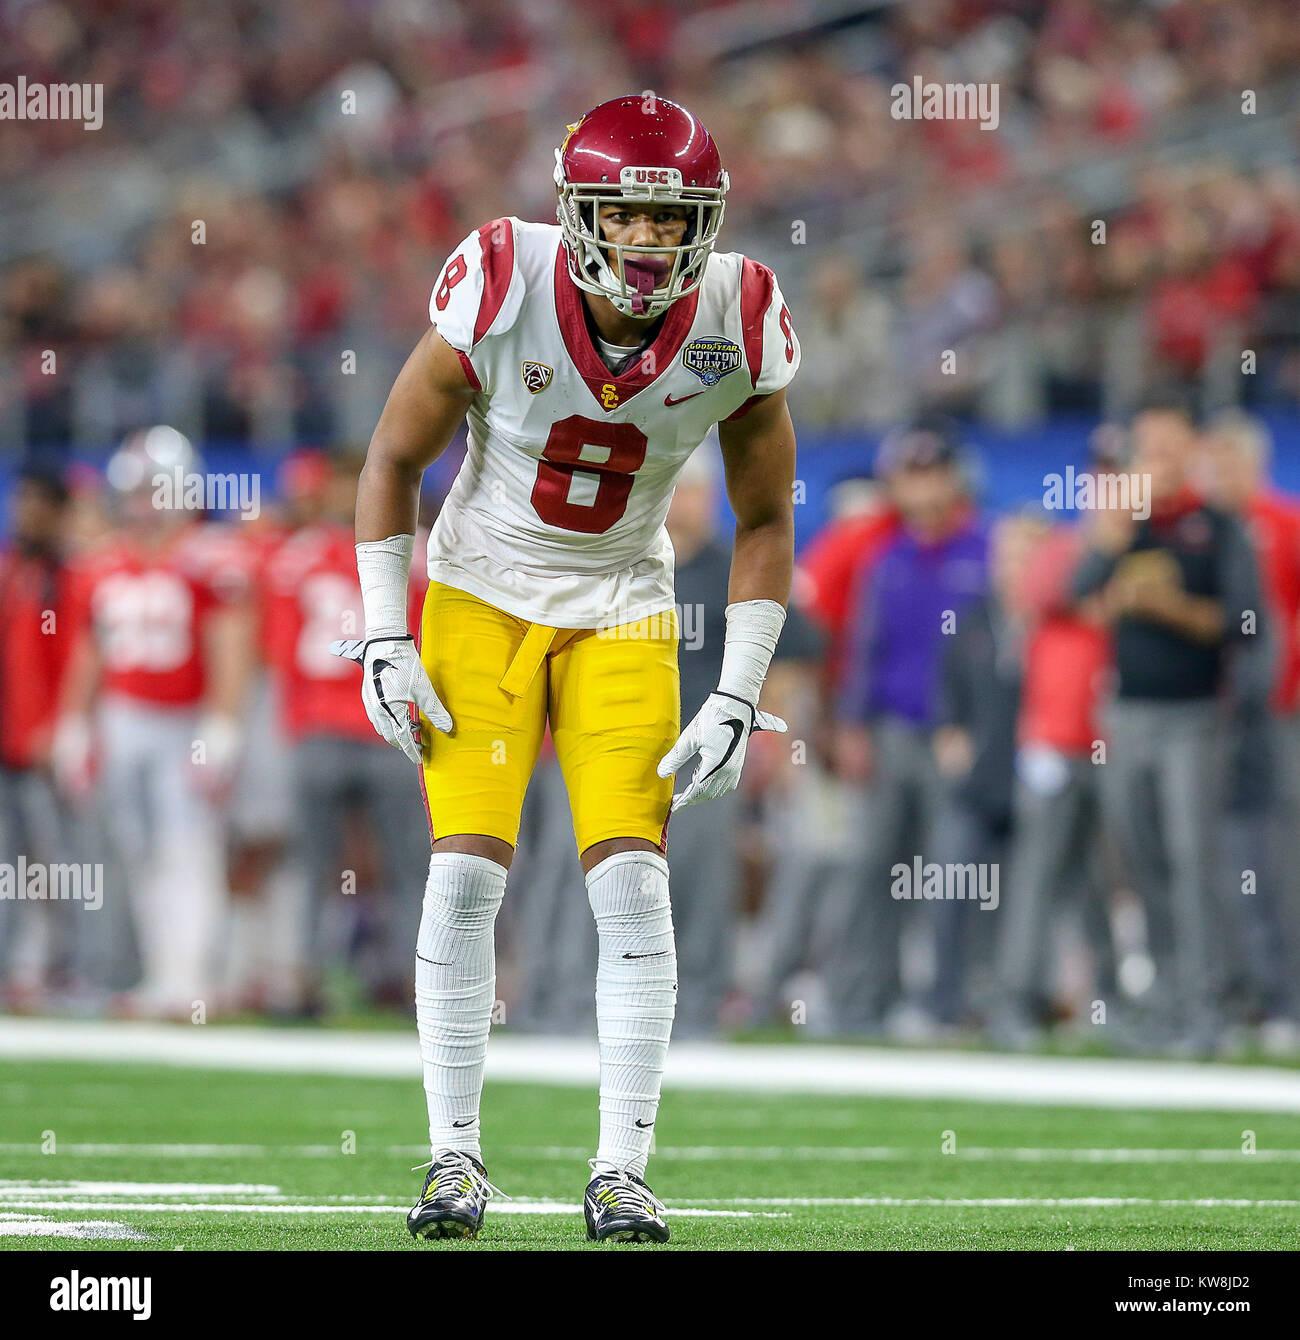 best website 18142 0105e Arlington, TX, USA. 29th Dec, 2017. USC Trojans cornerback ...